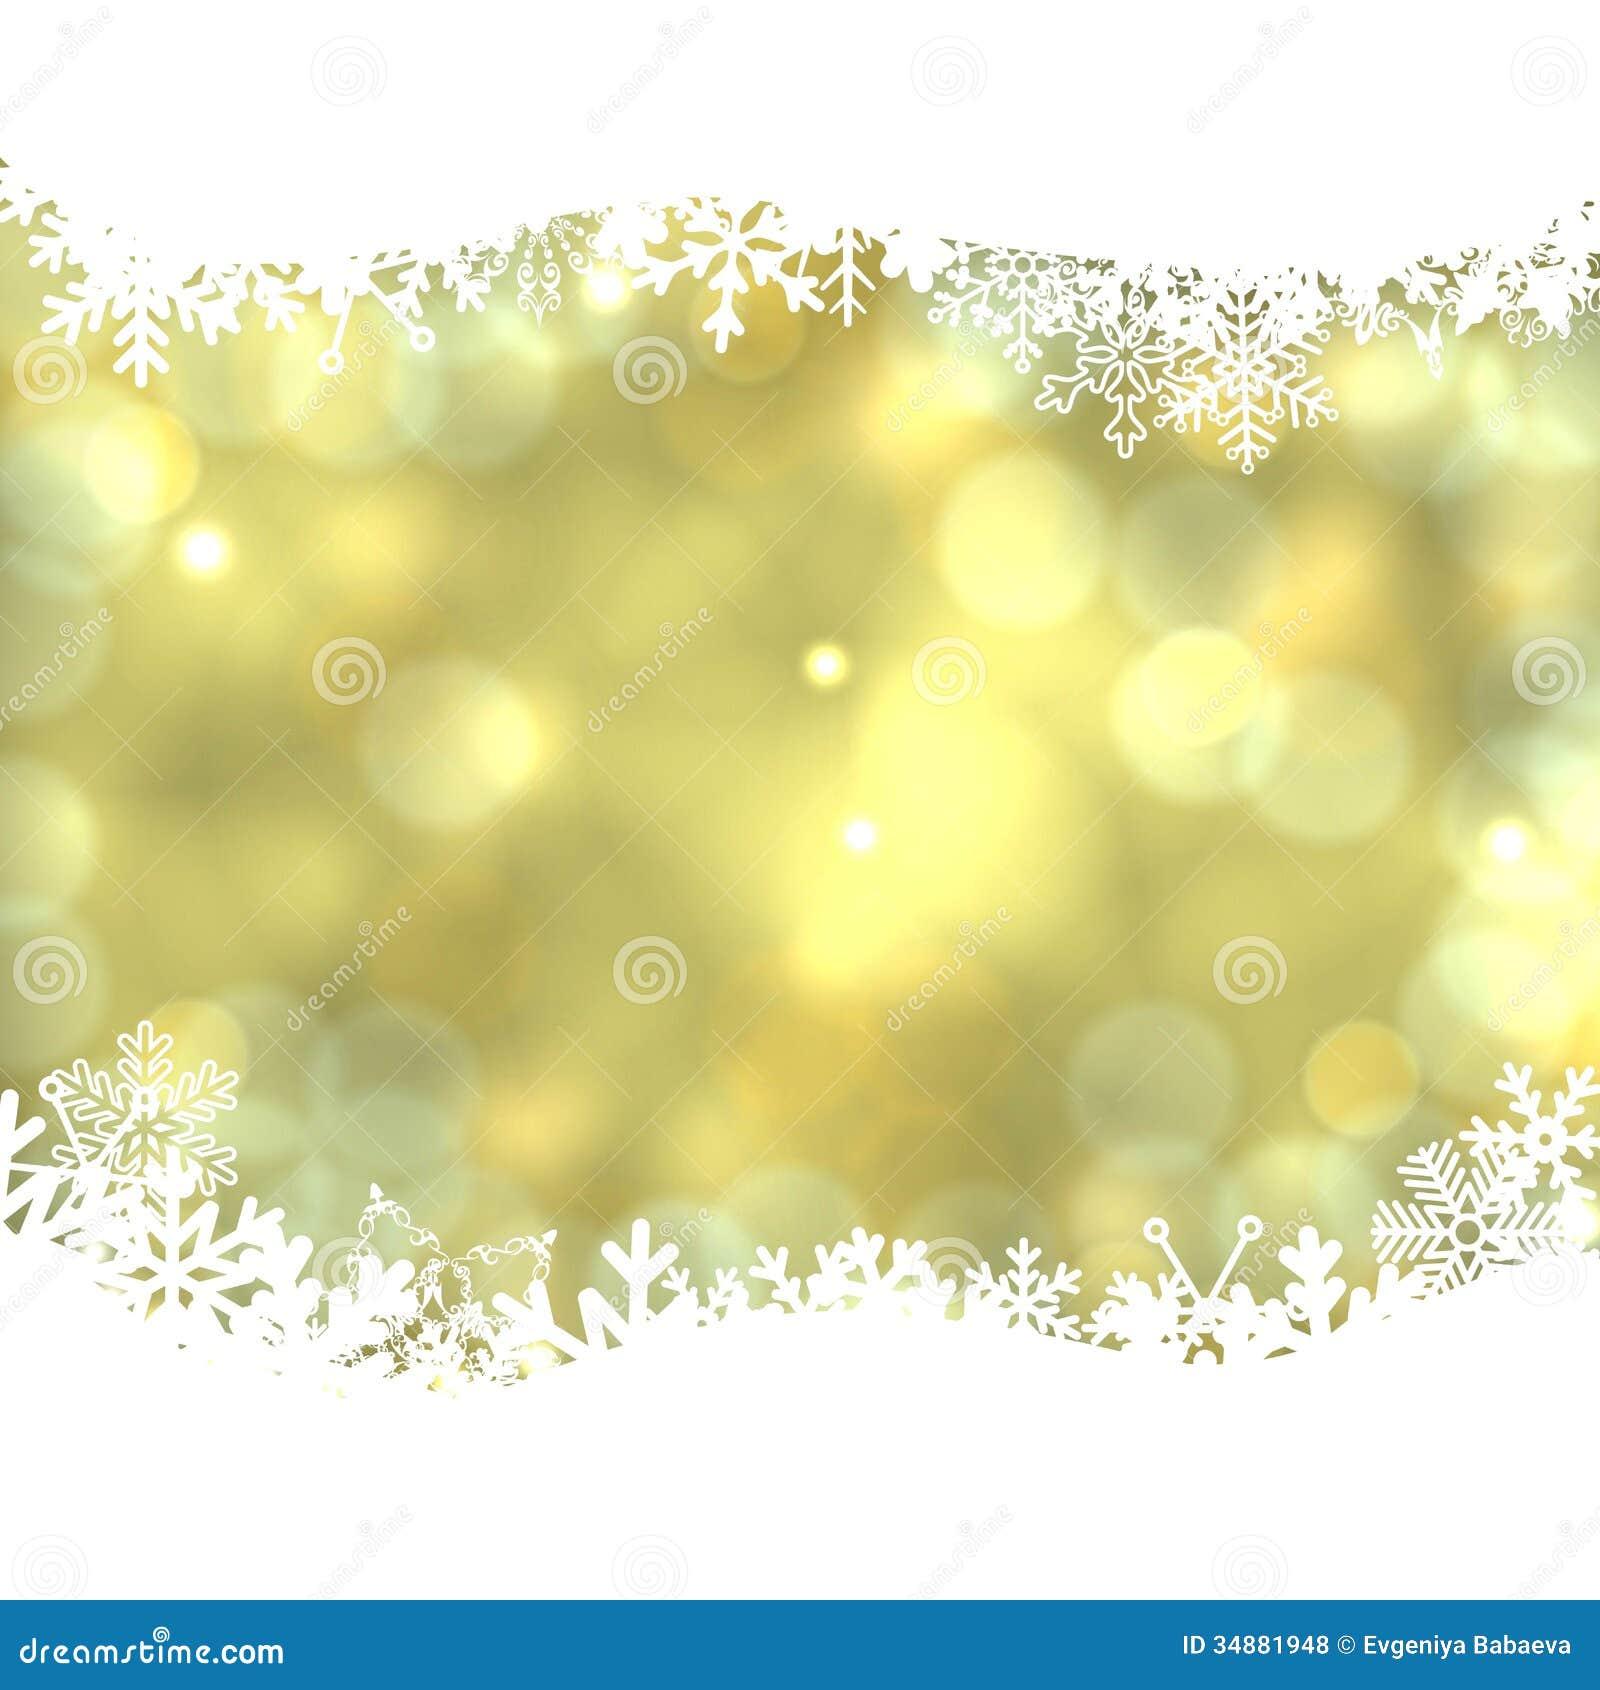 Elegant Christmas Background Wish Snowflakes. Royalty Free Stock ...